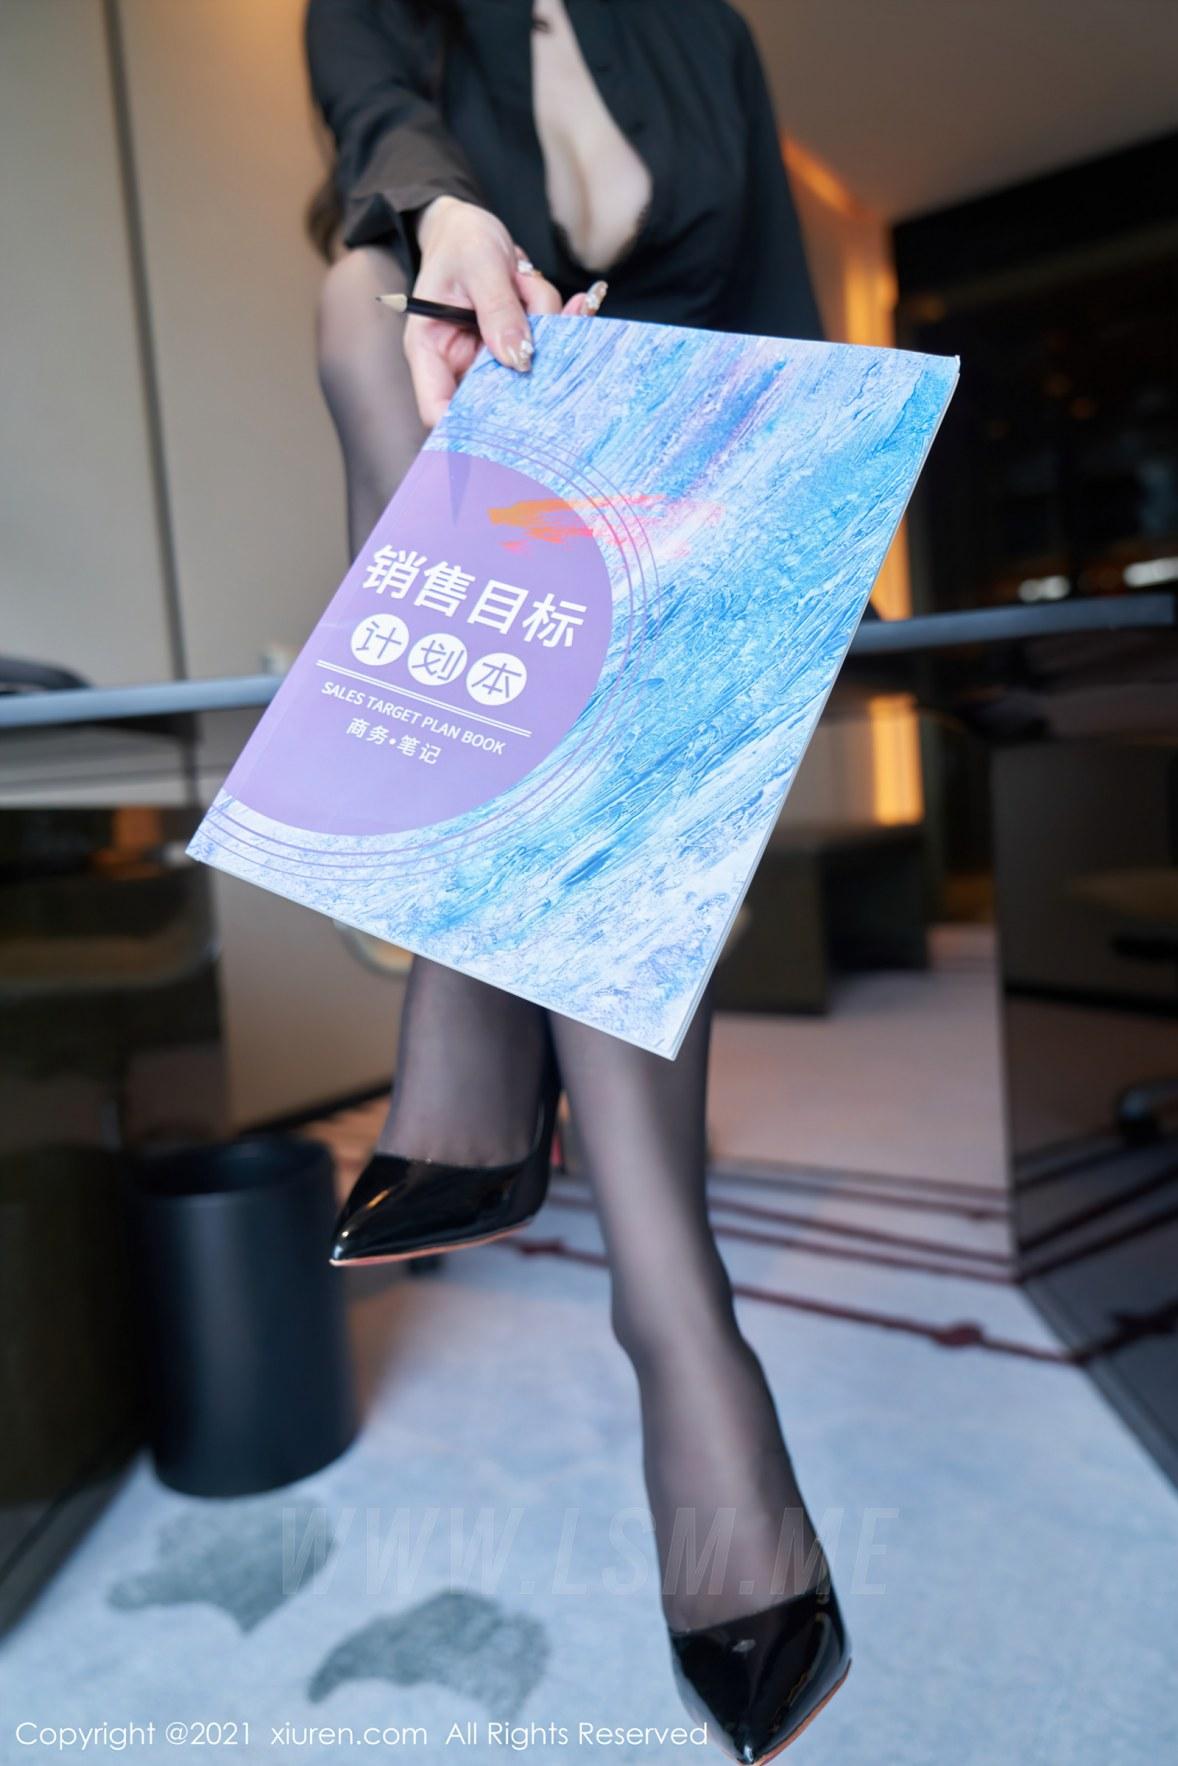 3773 037 l1f 3603 5400 - XiuRen 秀人 No.3773 销售经理职业装 周于希Sandy【私房高清壁纸视频素材】【免费在线写真】【丽人丝语】